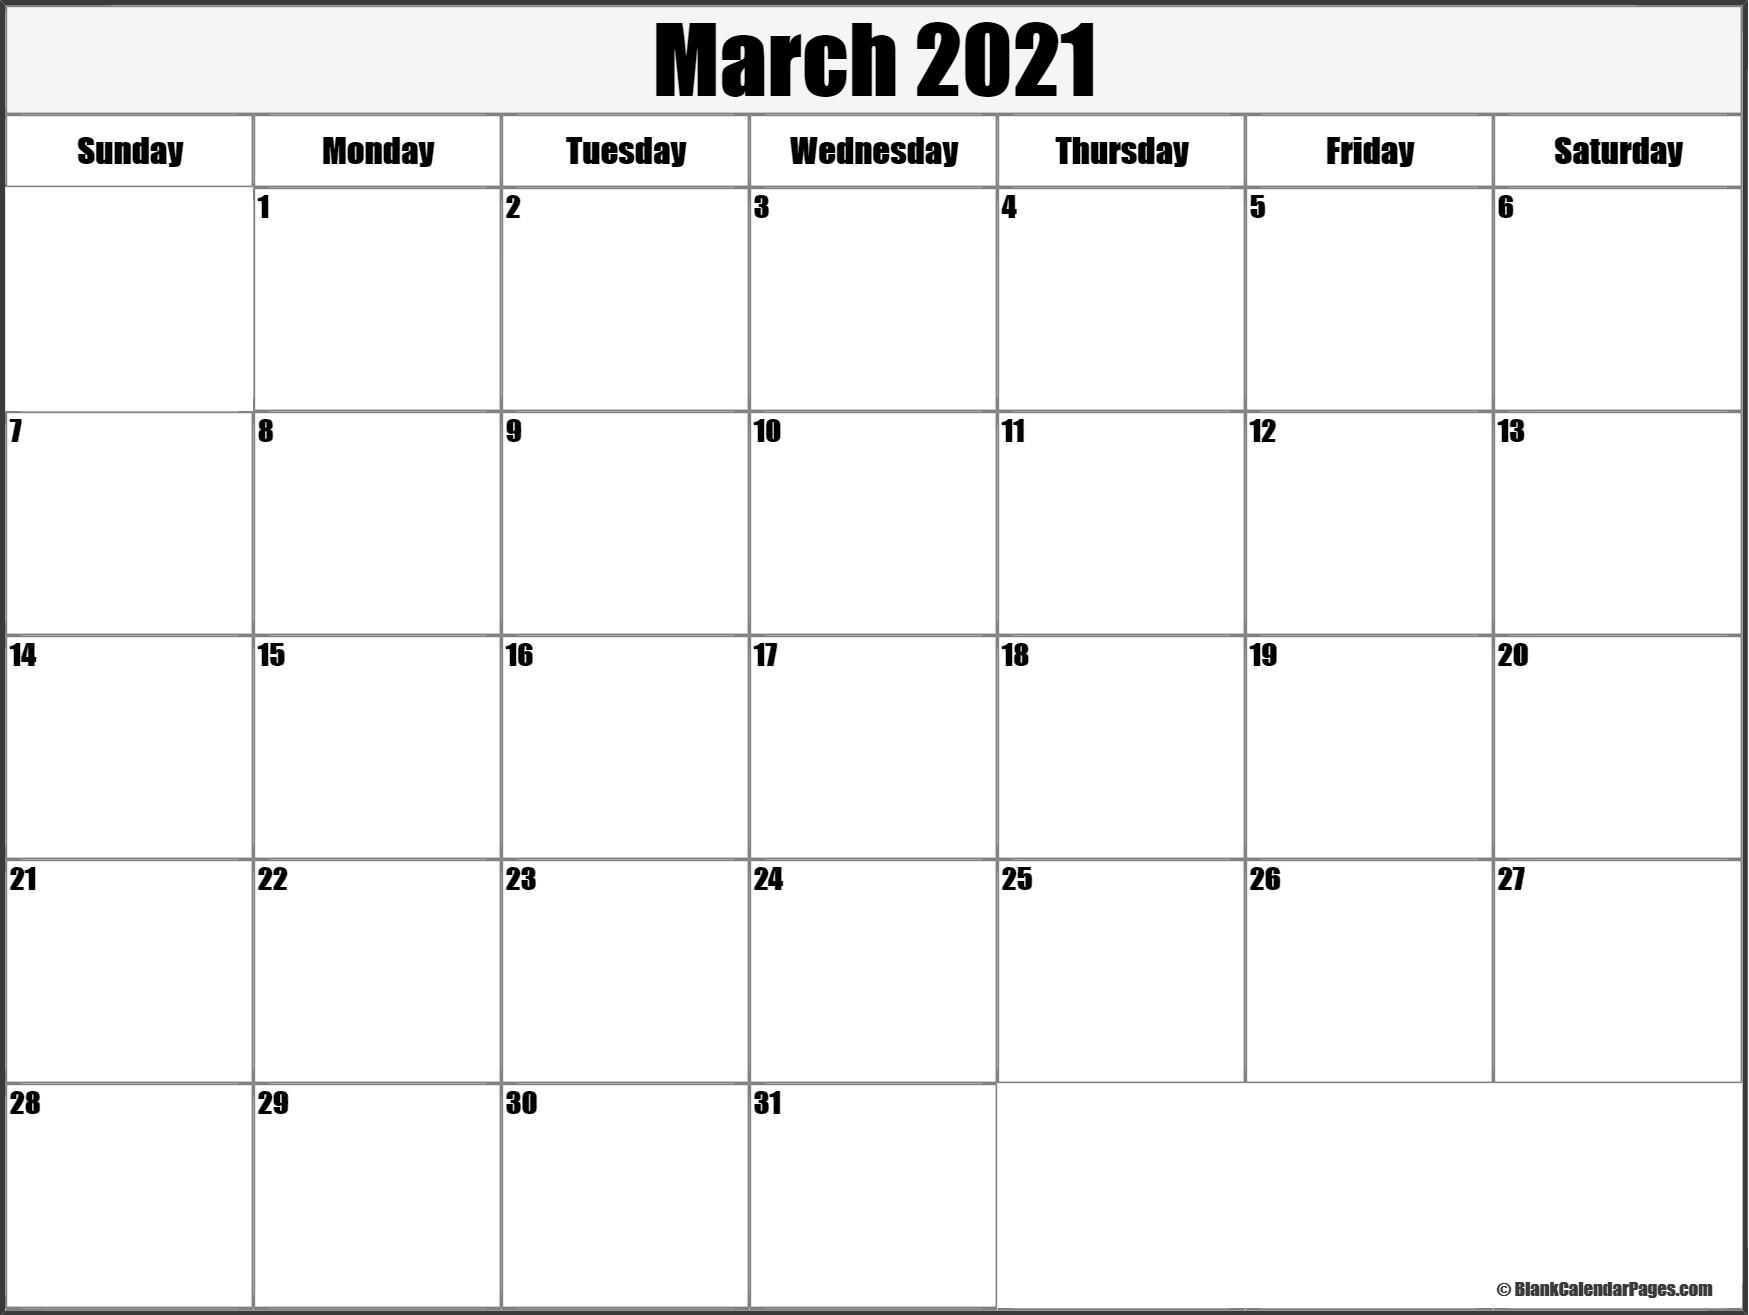 March 2021 Blank Calendar Collection